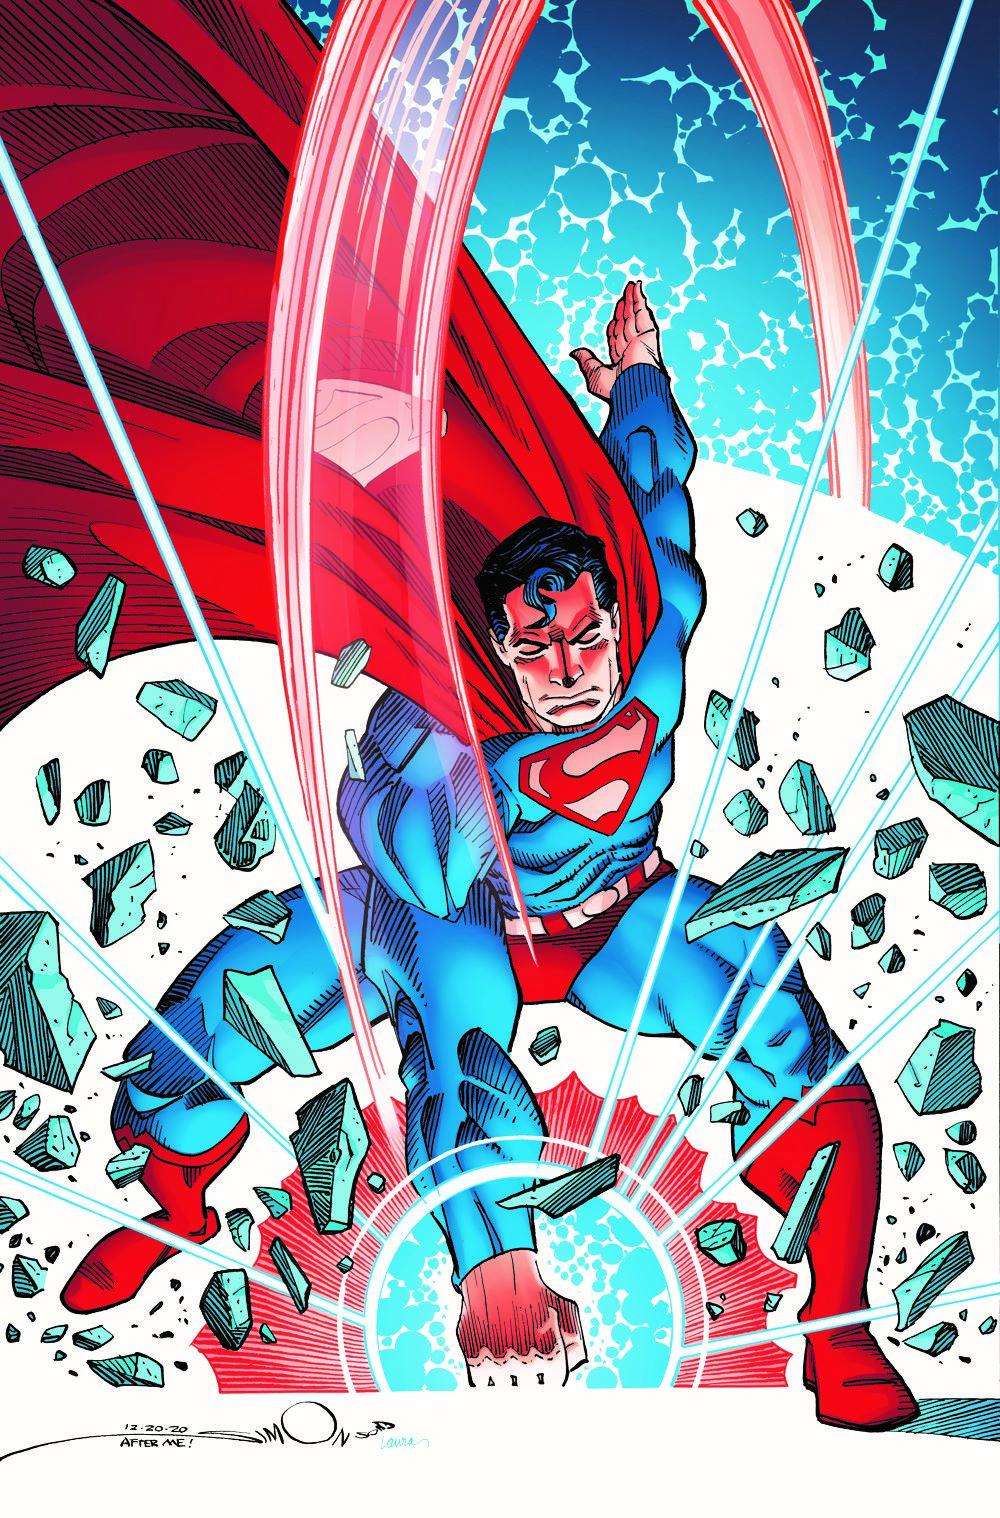 SUPERMAN-VARIANT-COVER.Simonson_CMYK DC Comics June 2021 Solicitations